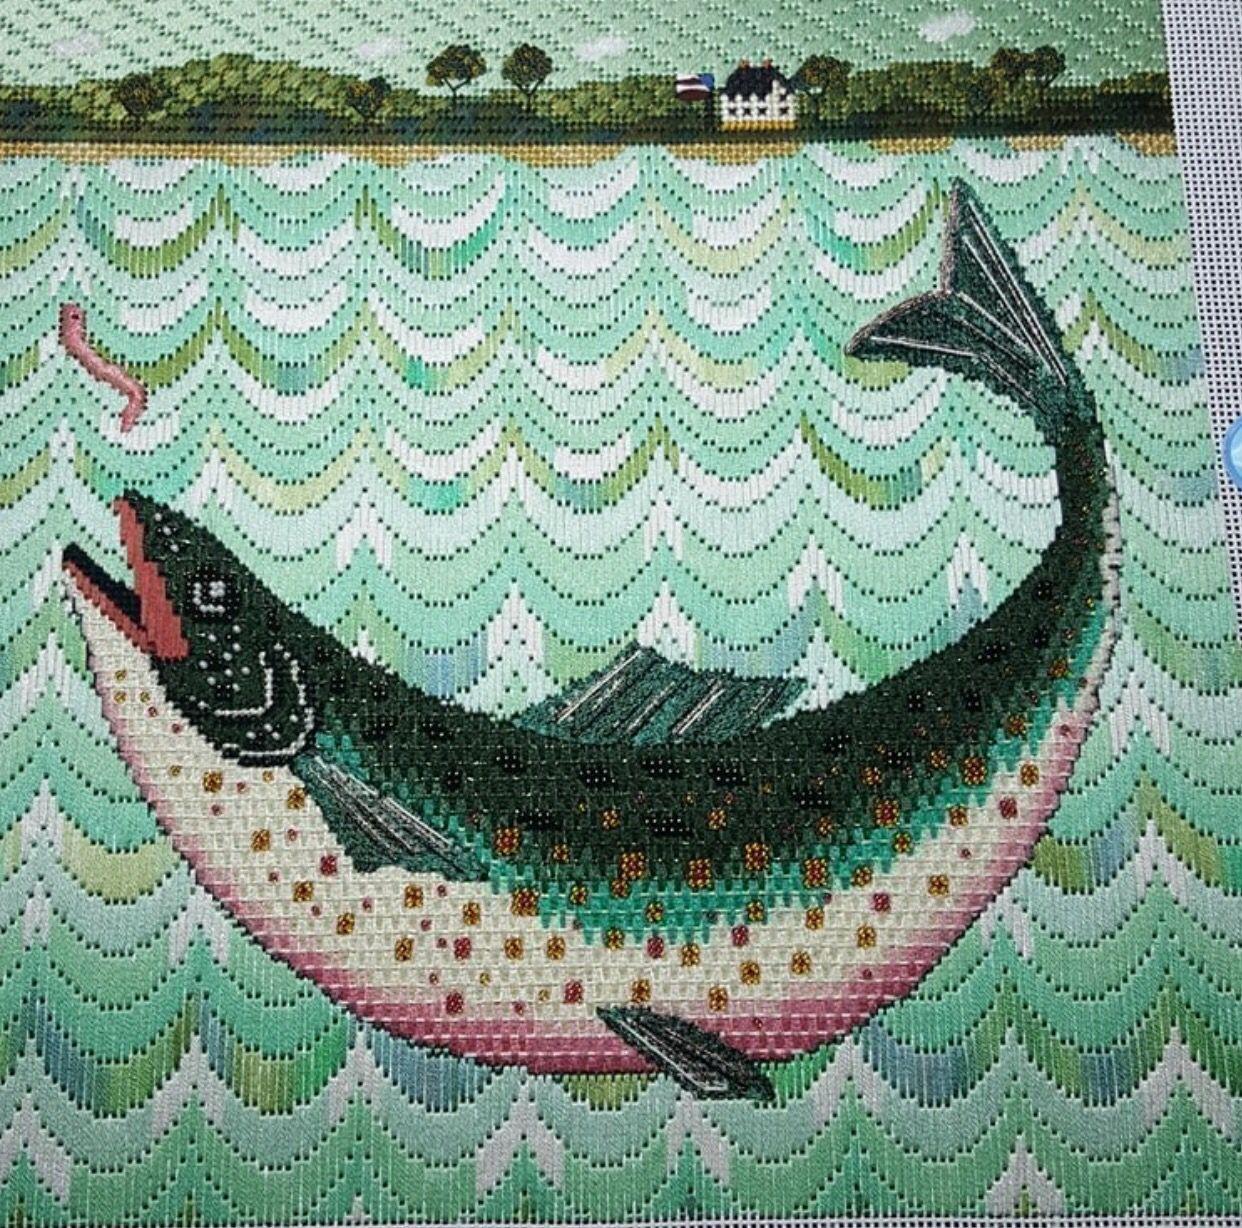 Stitch on fish